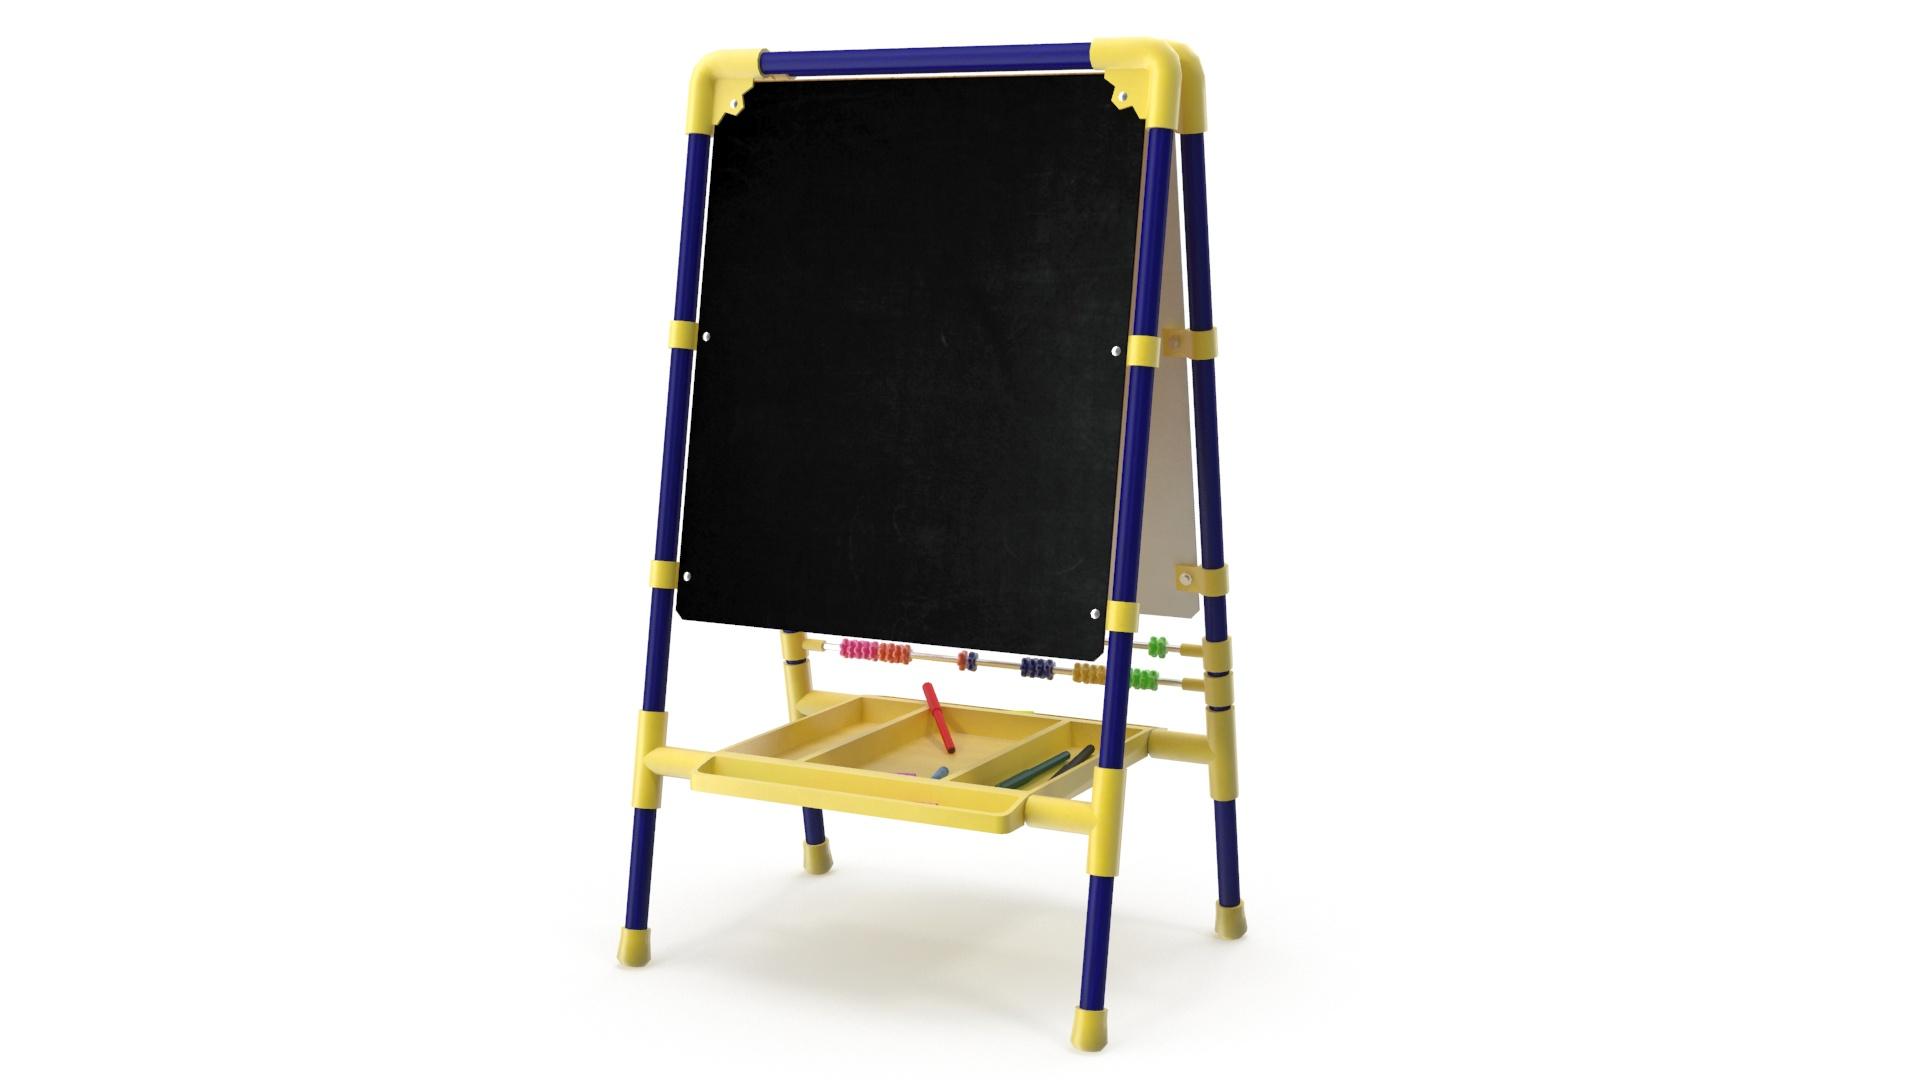 childrens drawing board 3d model 3ds max fbx obj 263604